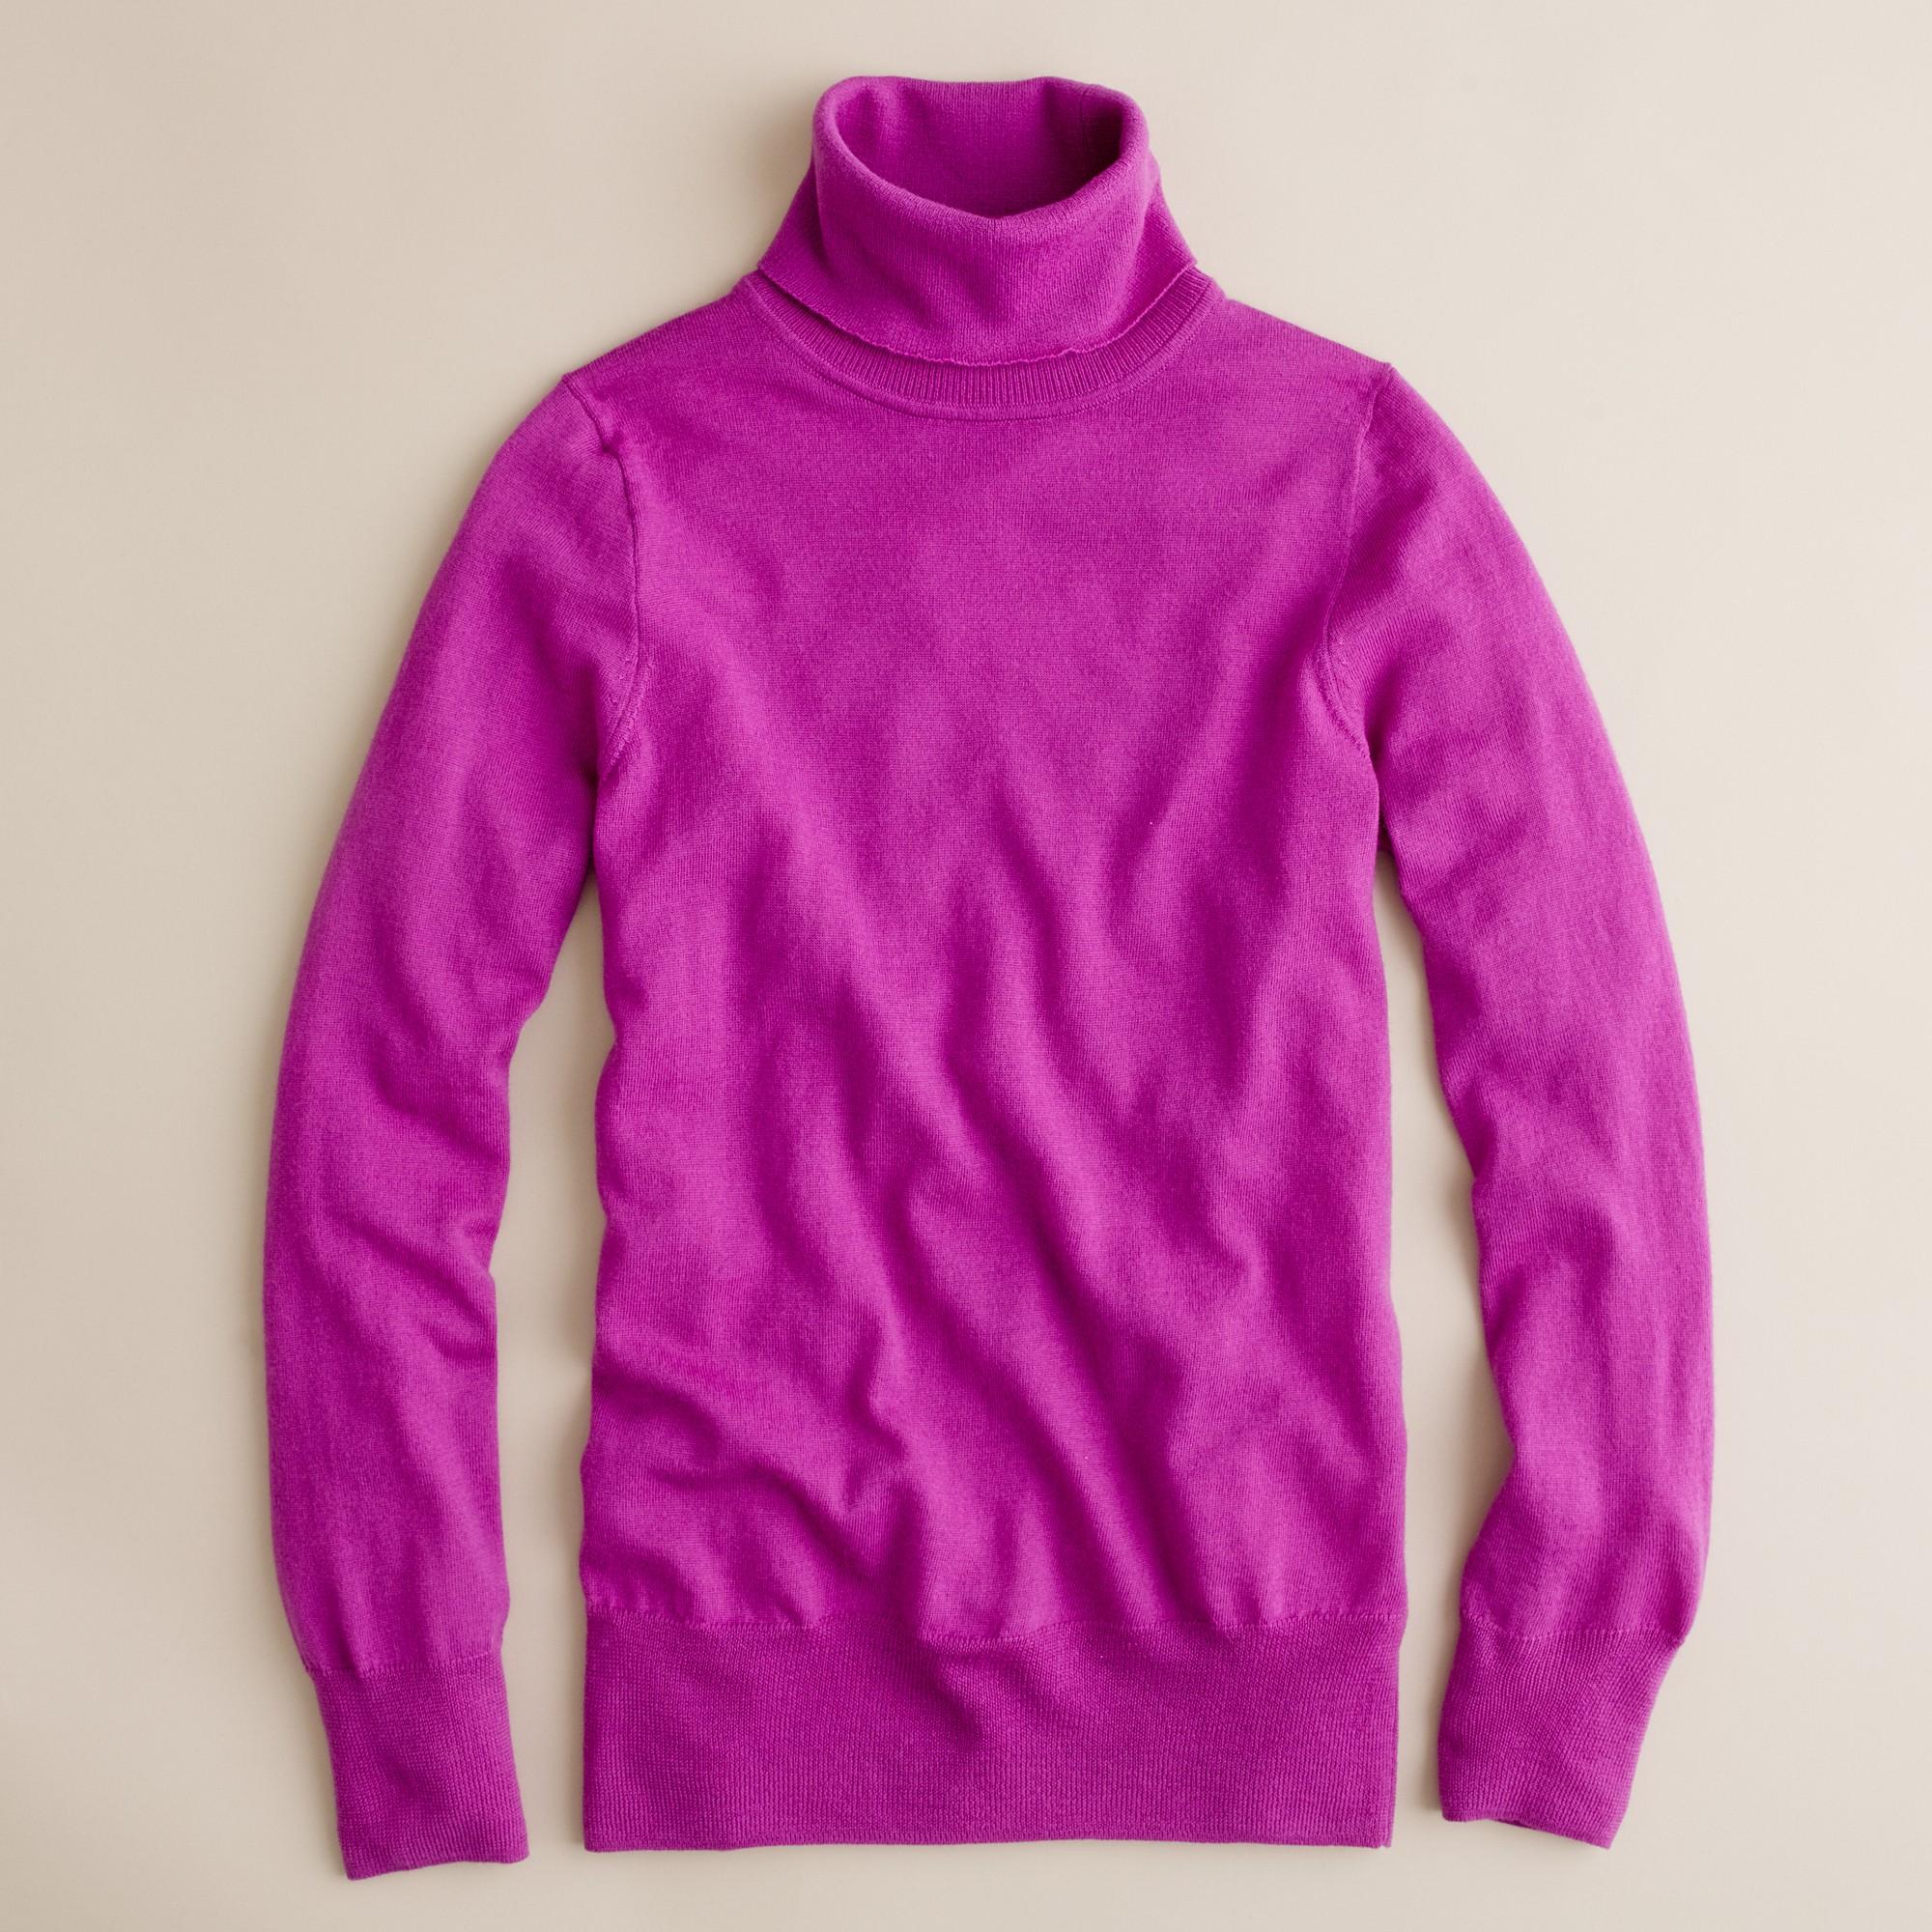 J.crew Merino Turtleneck Sweater in Purple | Lyst